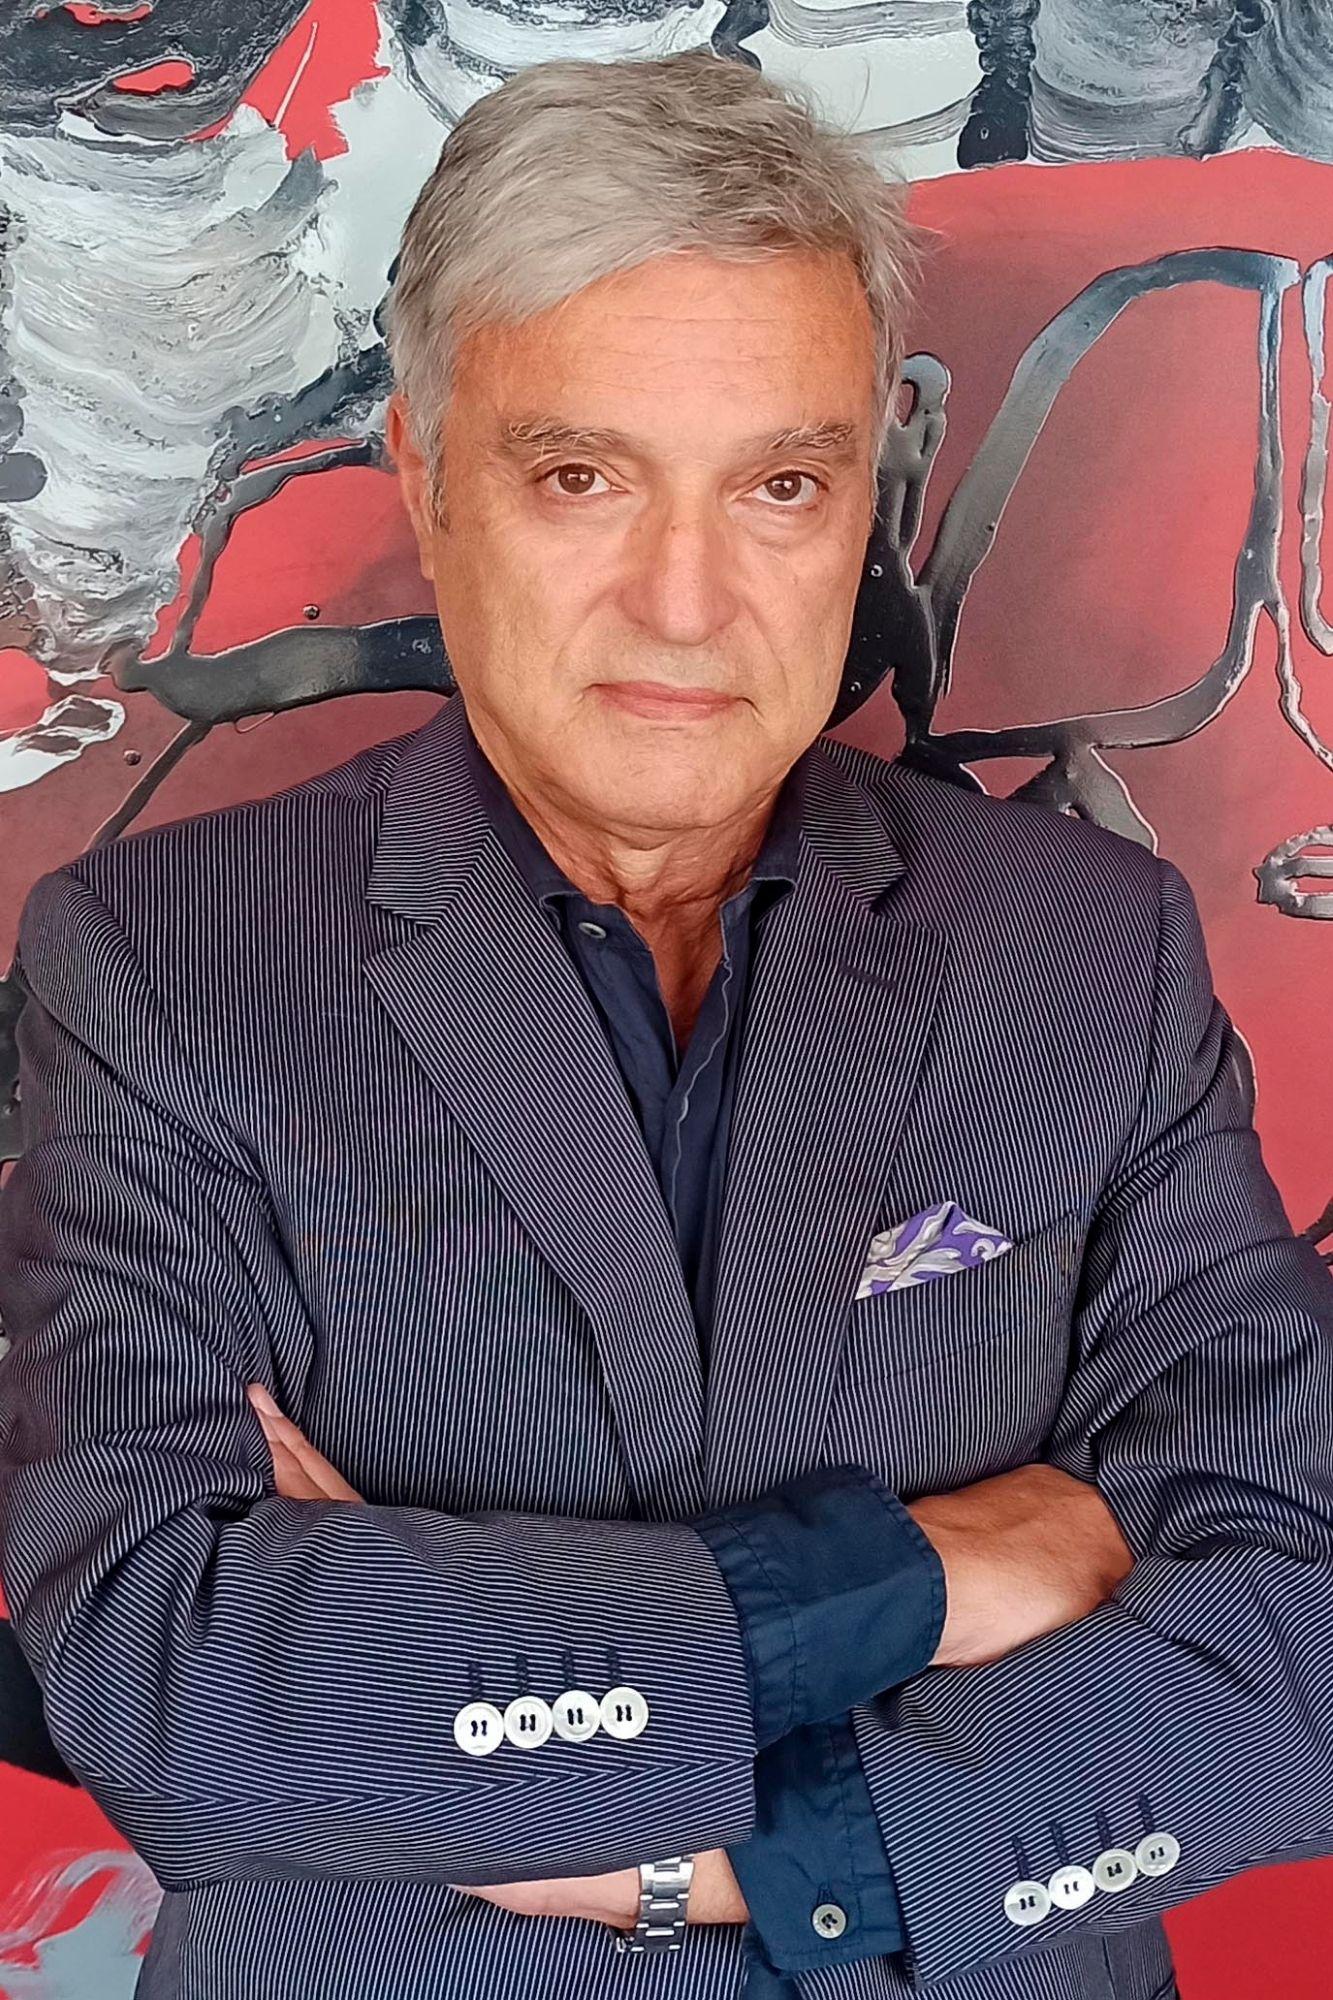 Humberto Martinho